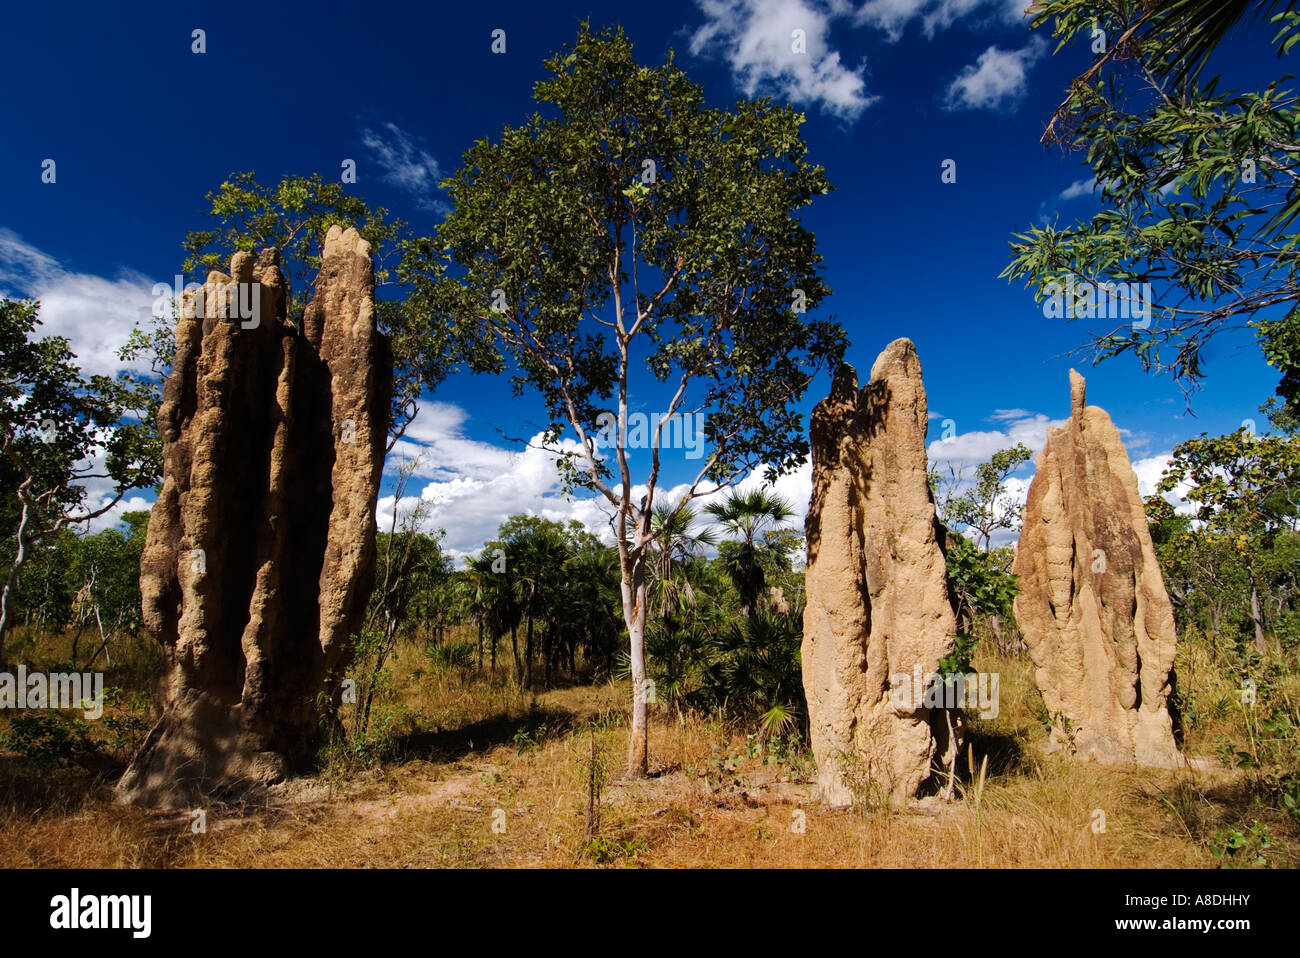 Termite hills in Litchfield National Park in Northern Territories near Darwin Australia 2007 - Stock Image